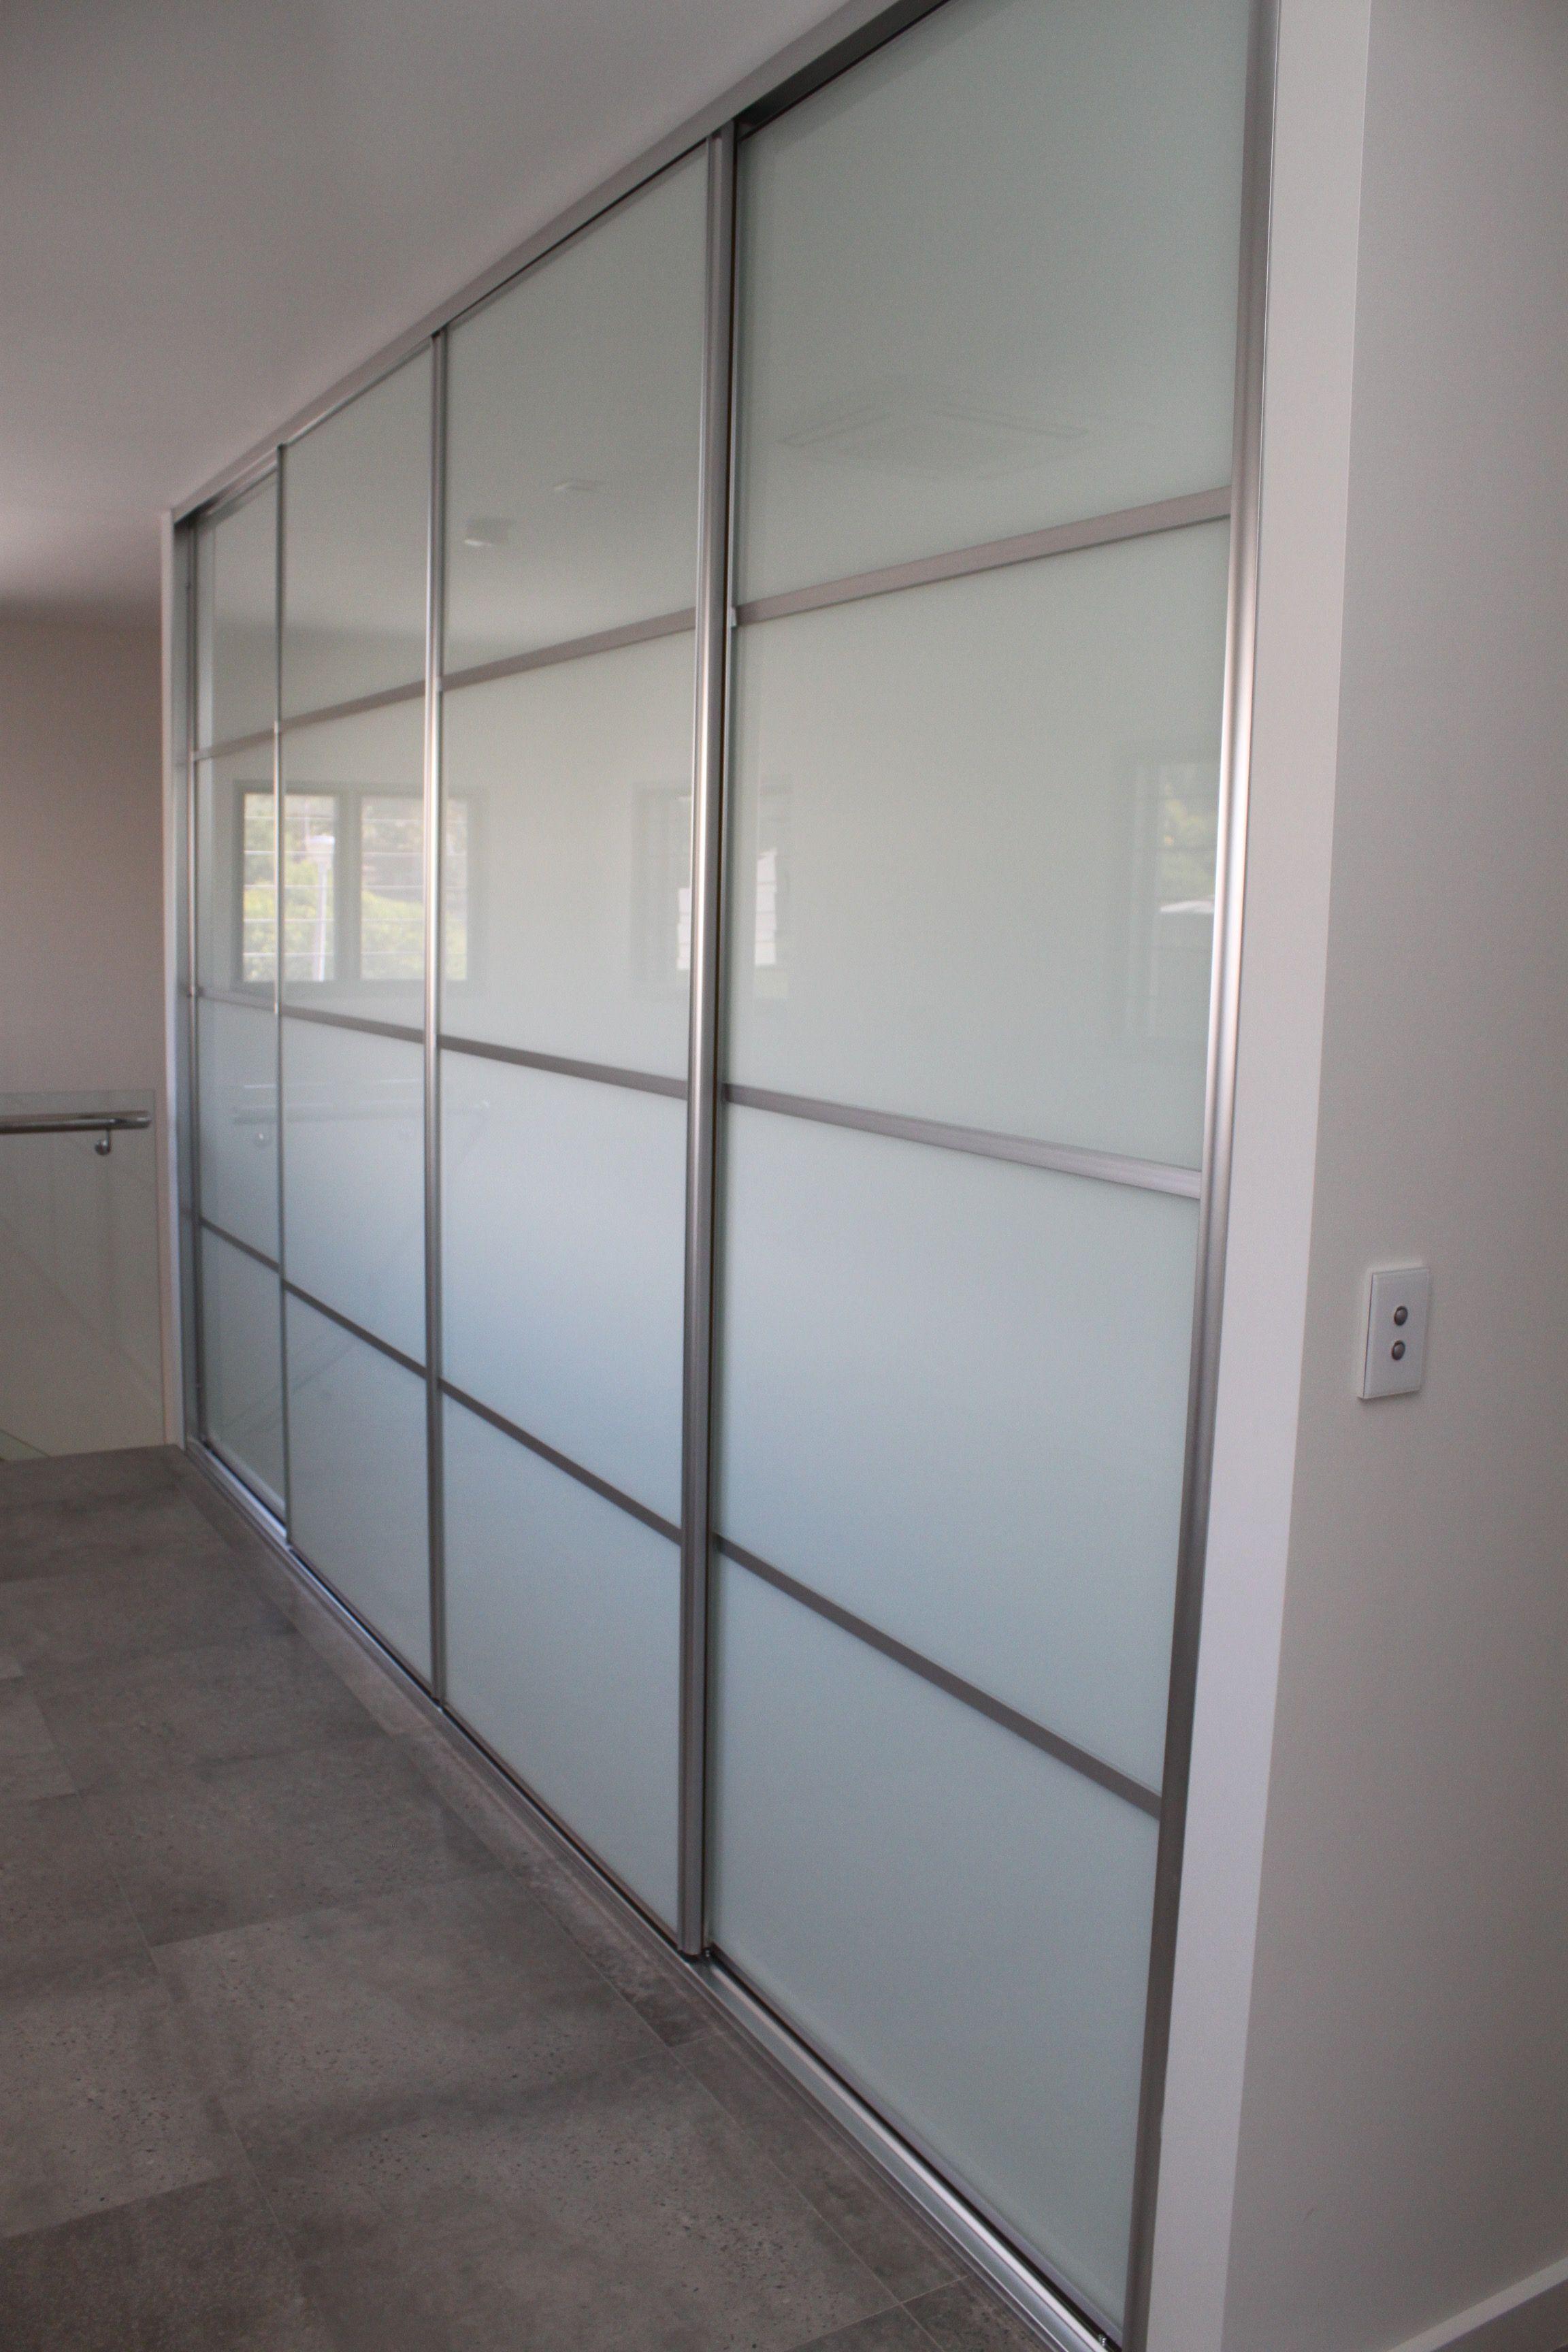 Linen Cupboard/Hallway Sliding DoorsWhite Gl 4 panel sliding ... on